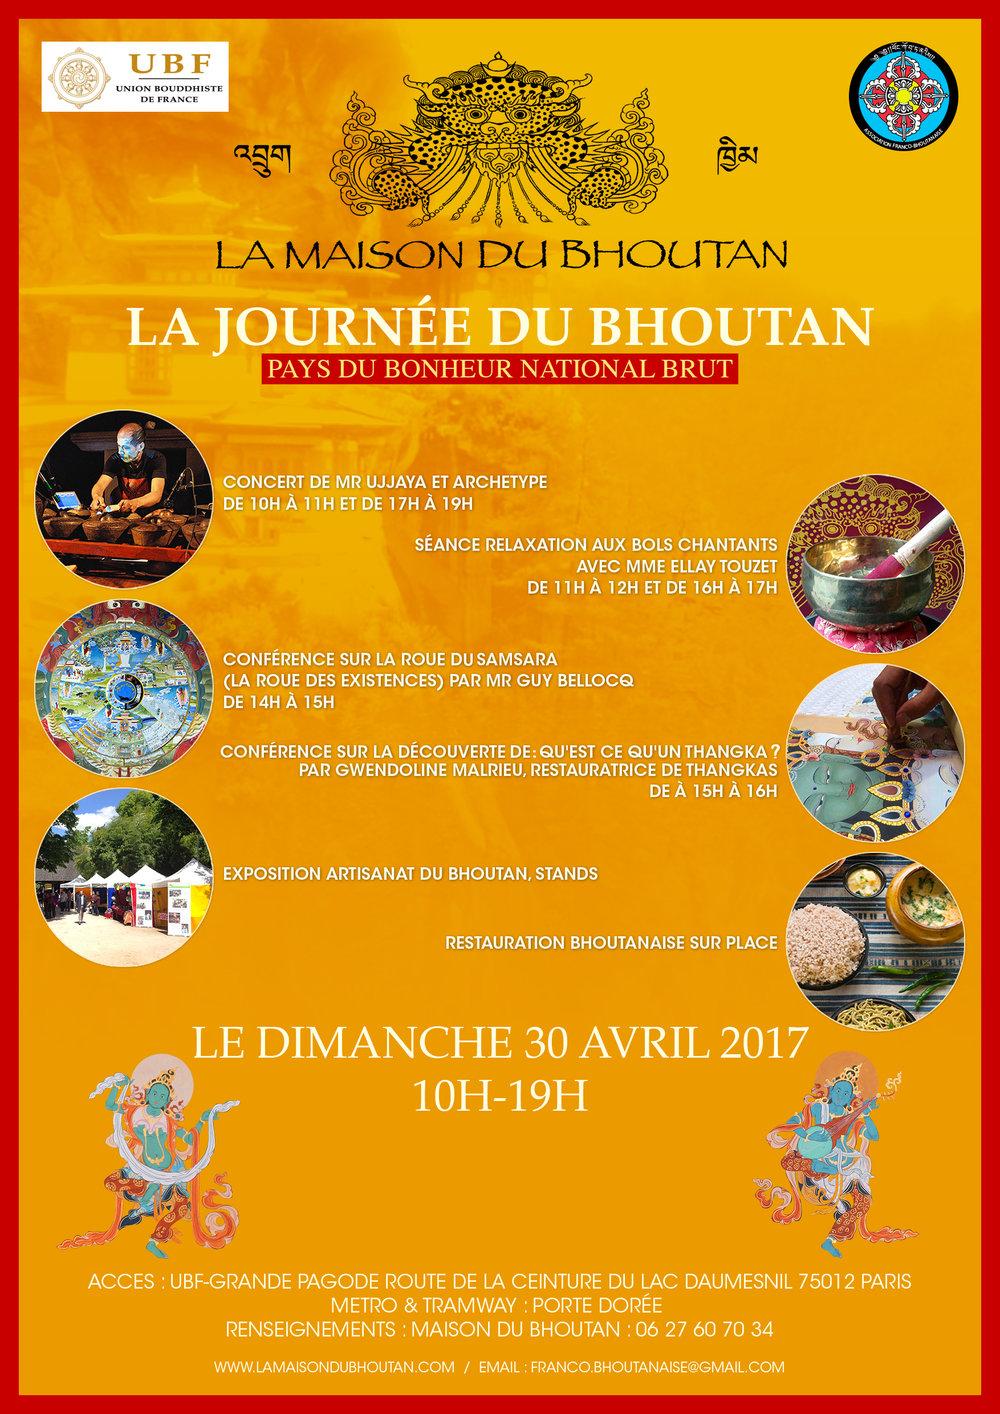 thangka-conference-gwendoline-malrieu-restauratrice-de-thangkas